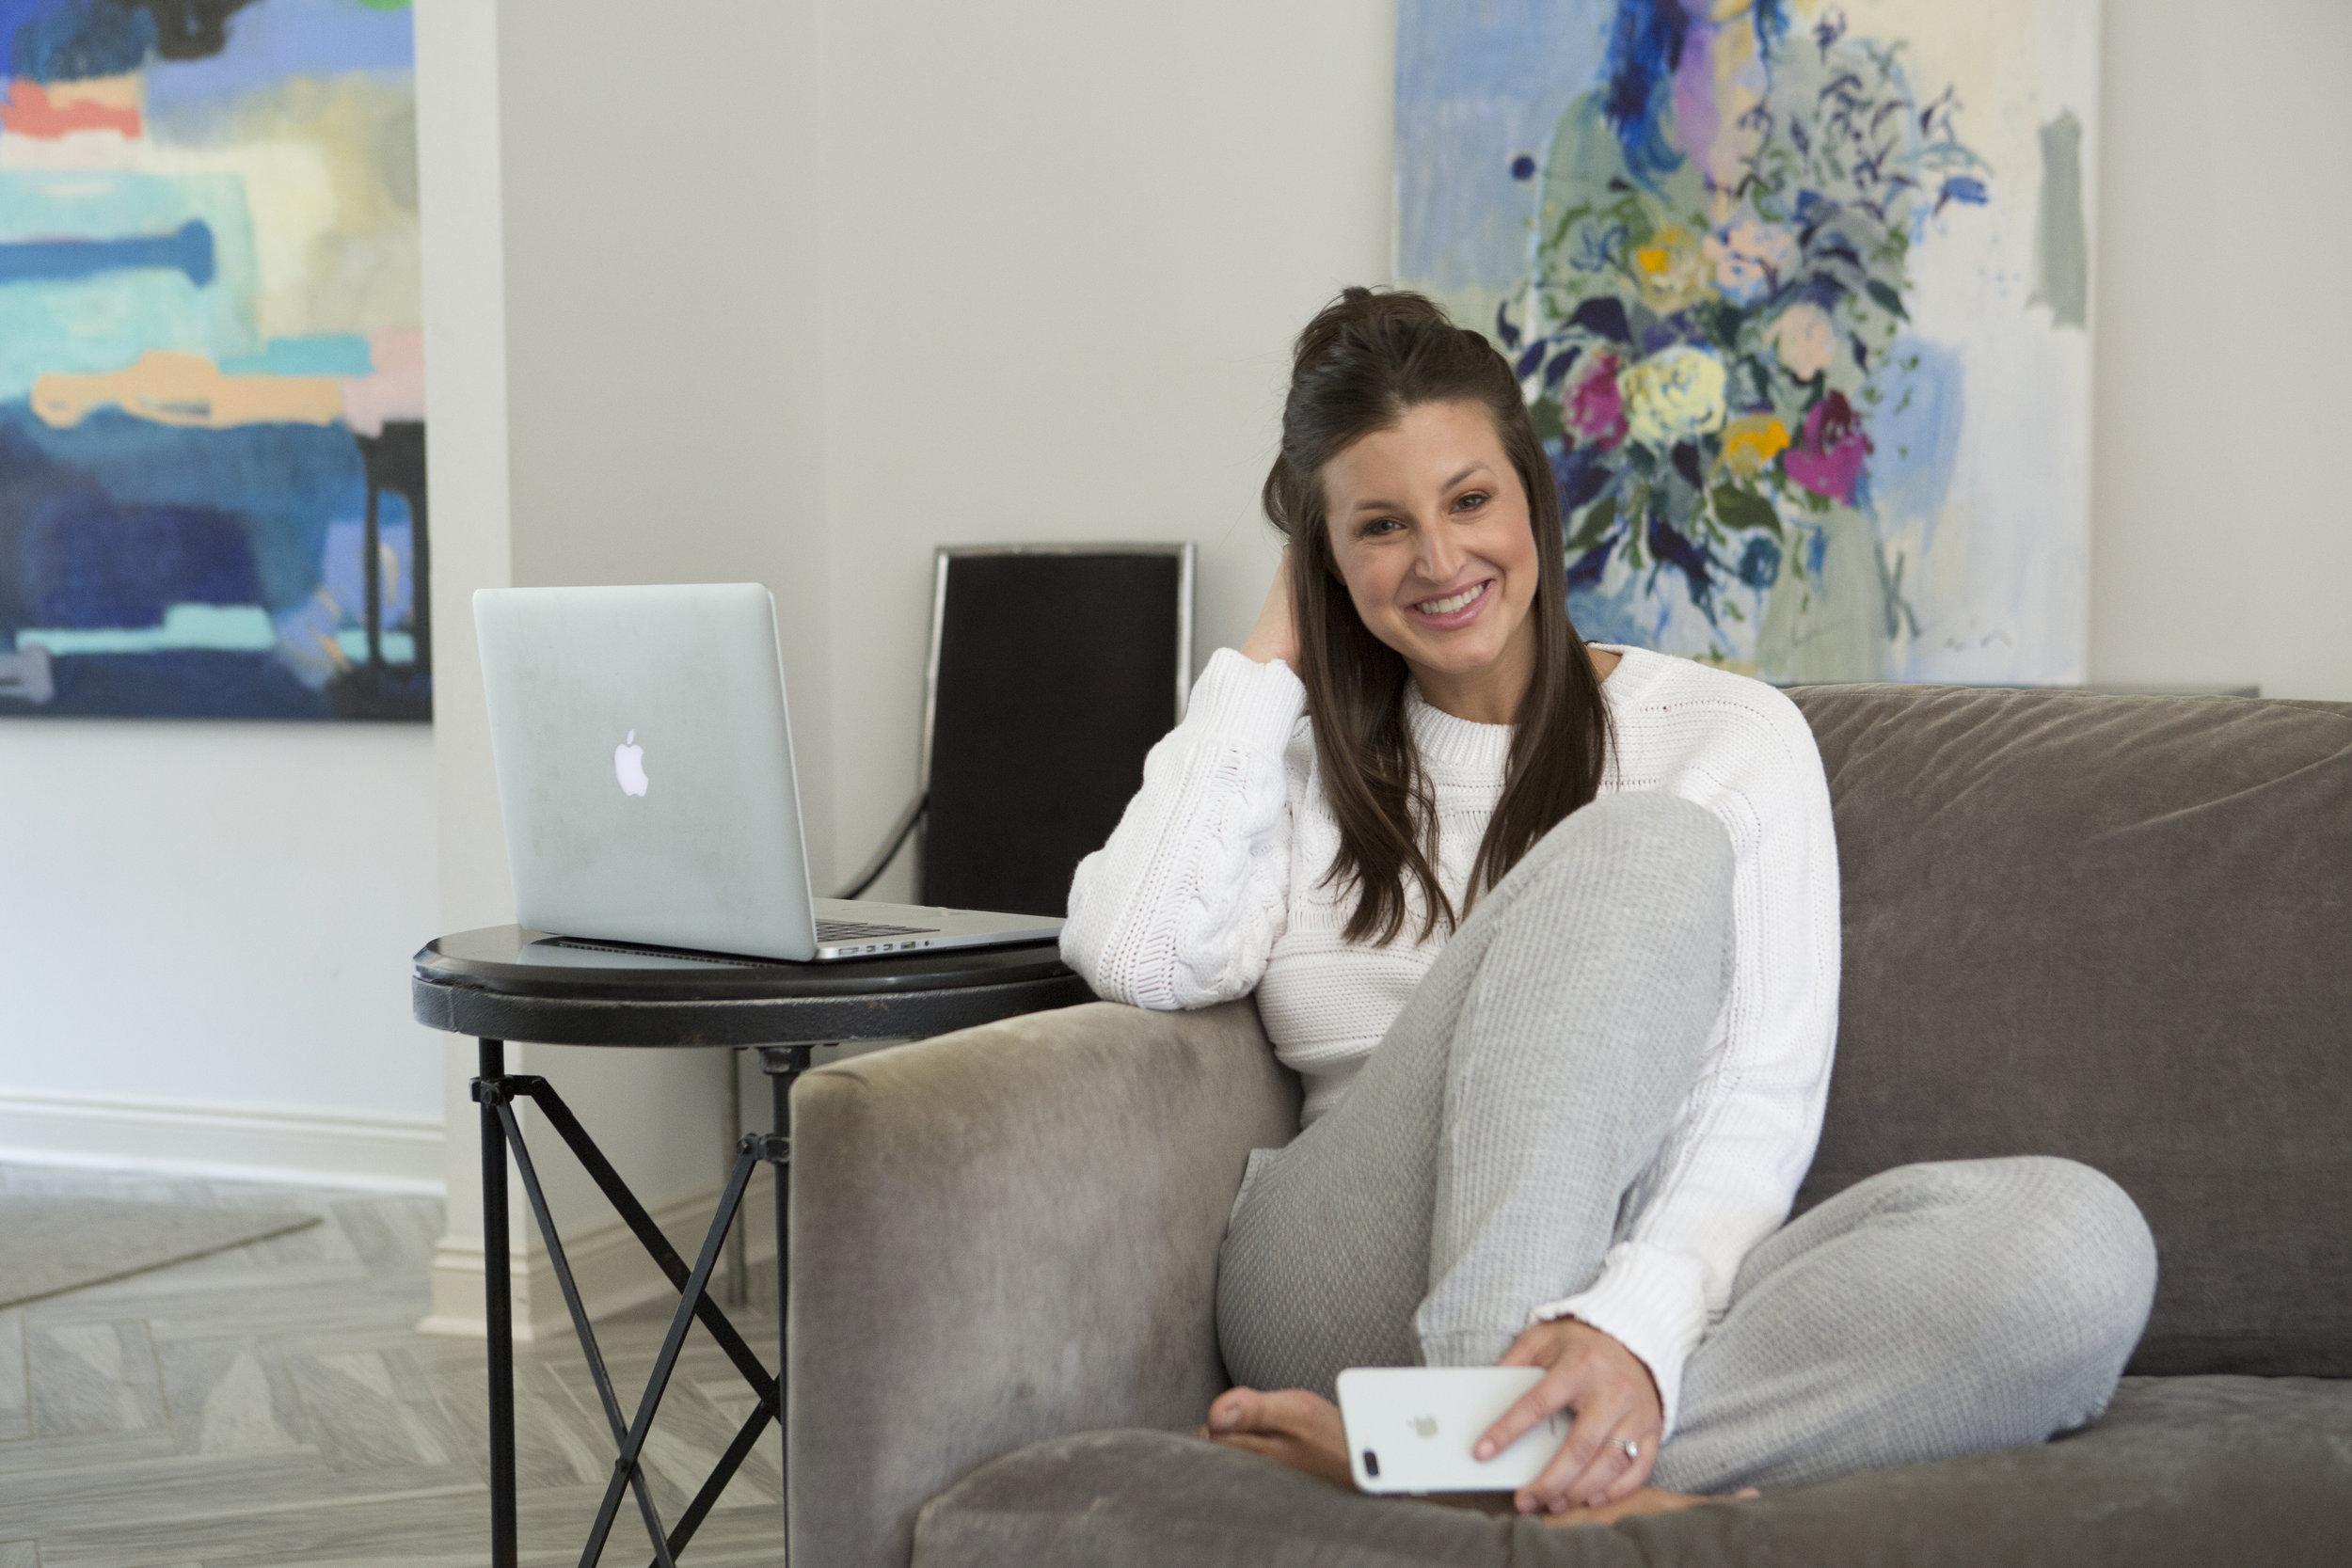 jessica-zimmerman-events-instagram-live-business-mentor.JPG